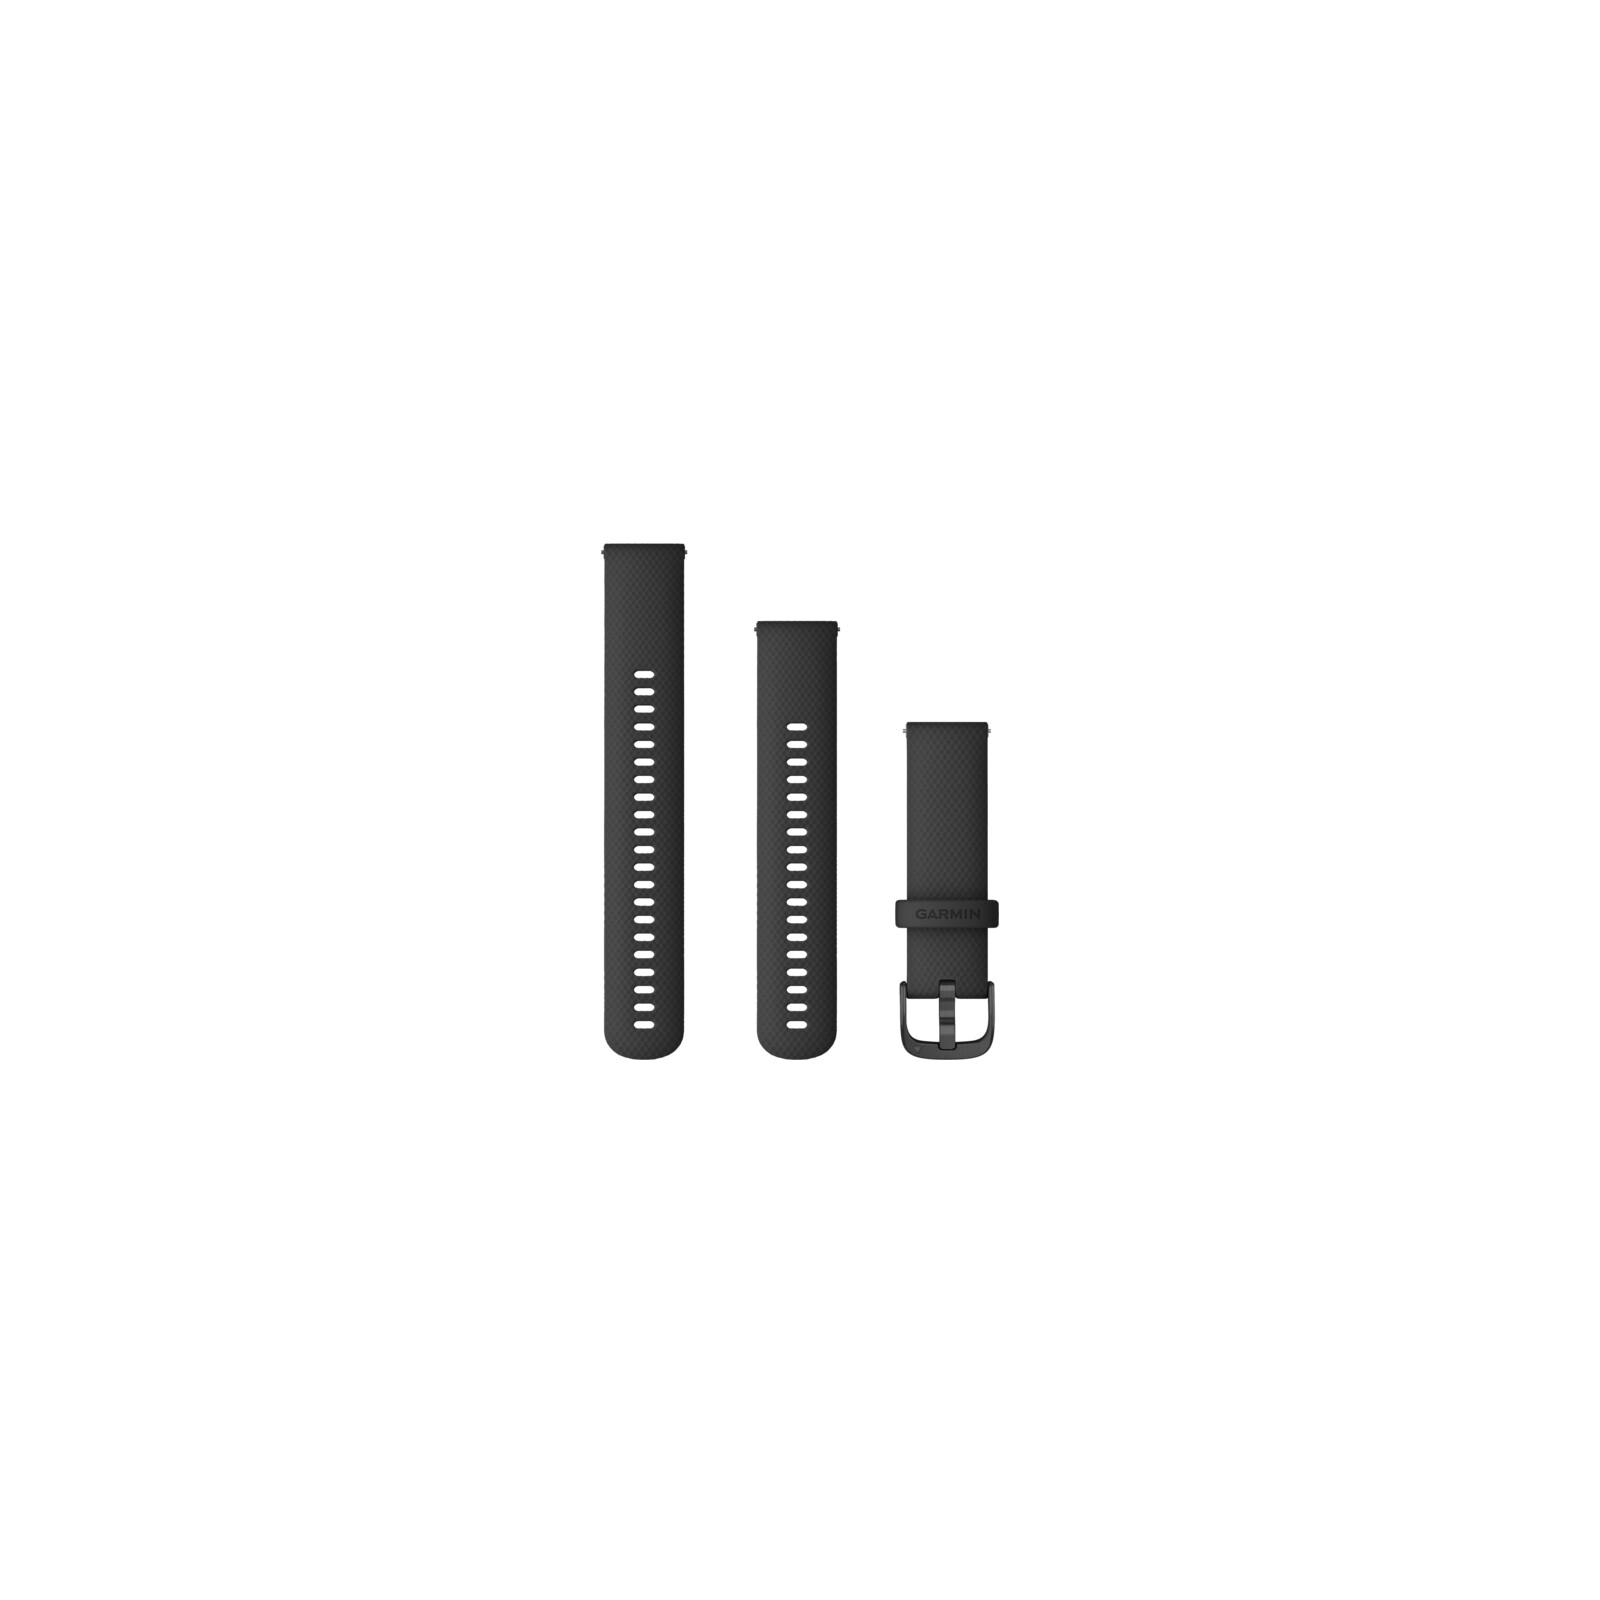 Garmin Schnellwechsel Armband Silikon 22mm Schwarz